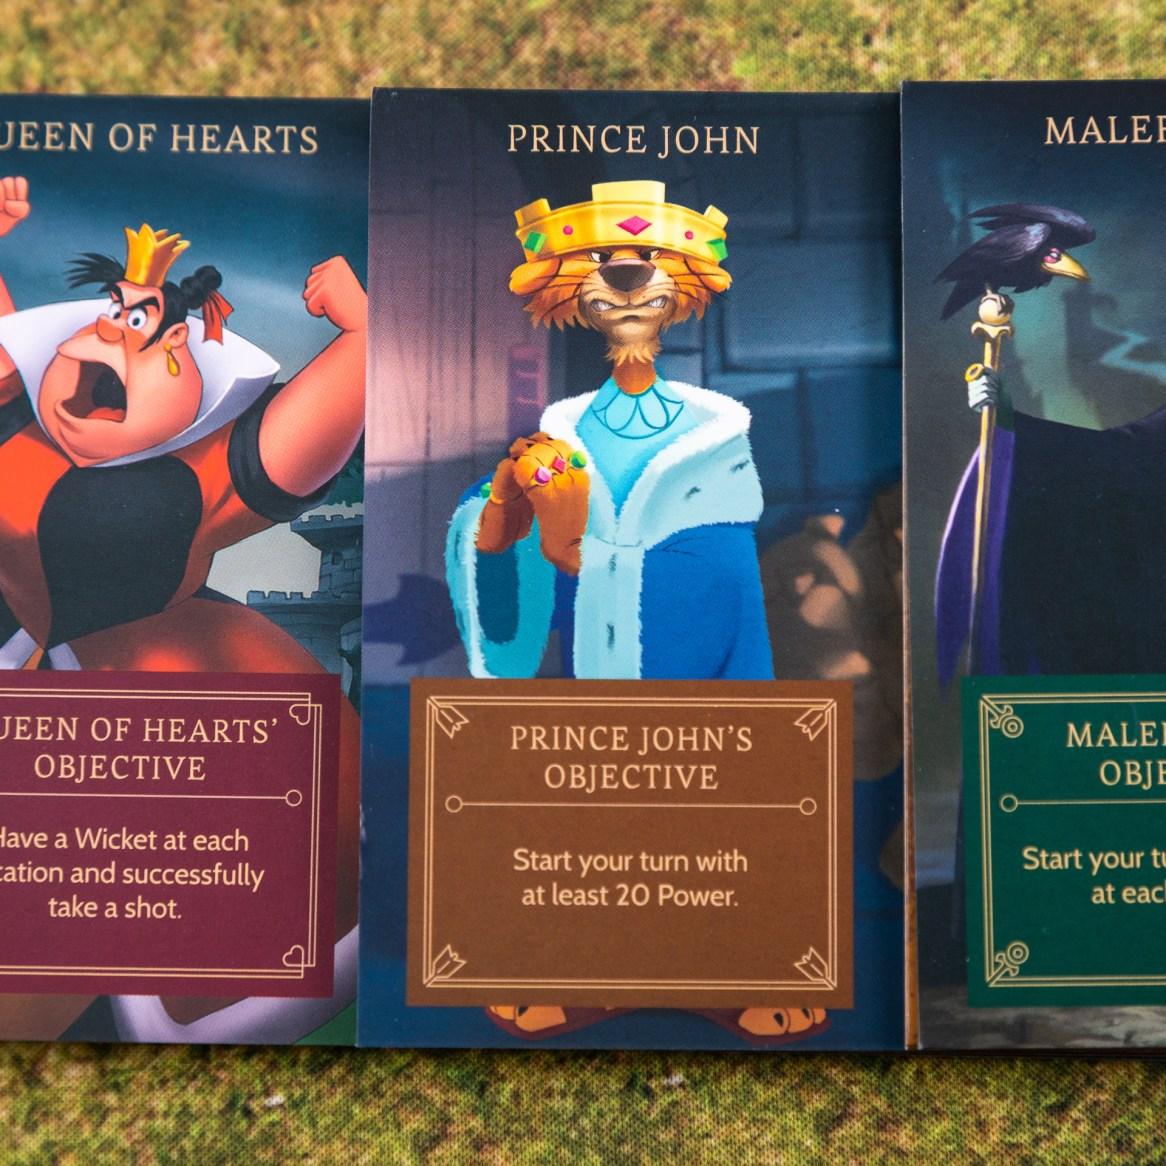 Villainous Ravensburger een super leuk en spannend Board Game Spel van Disney